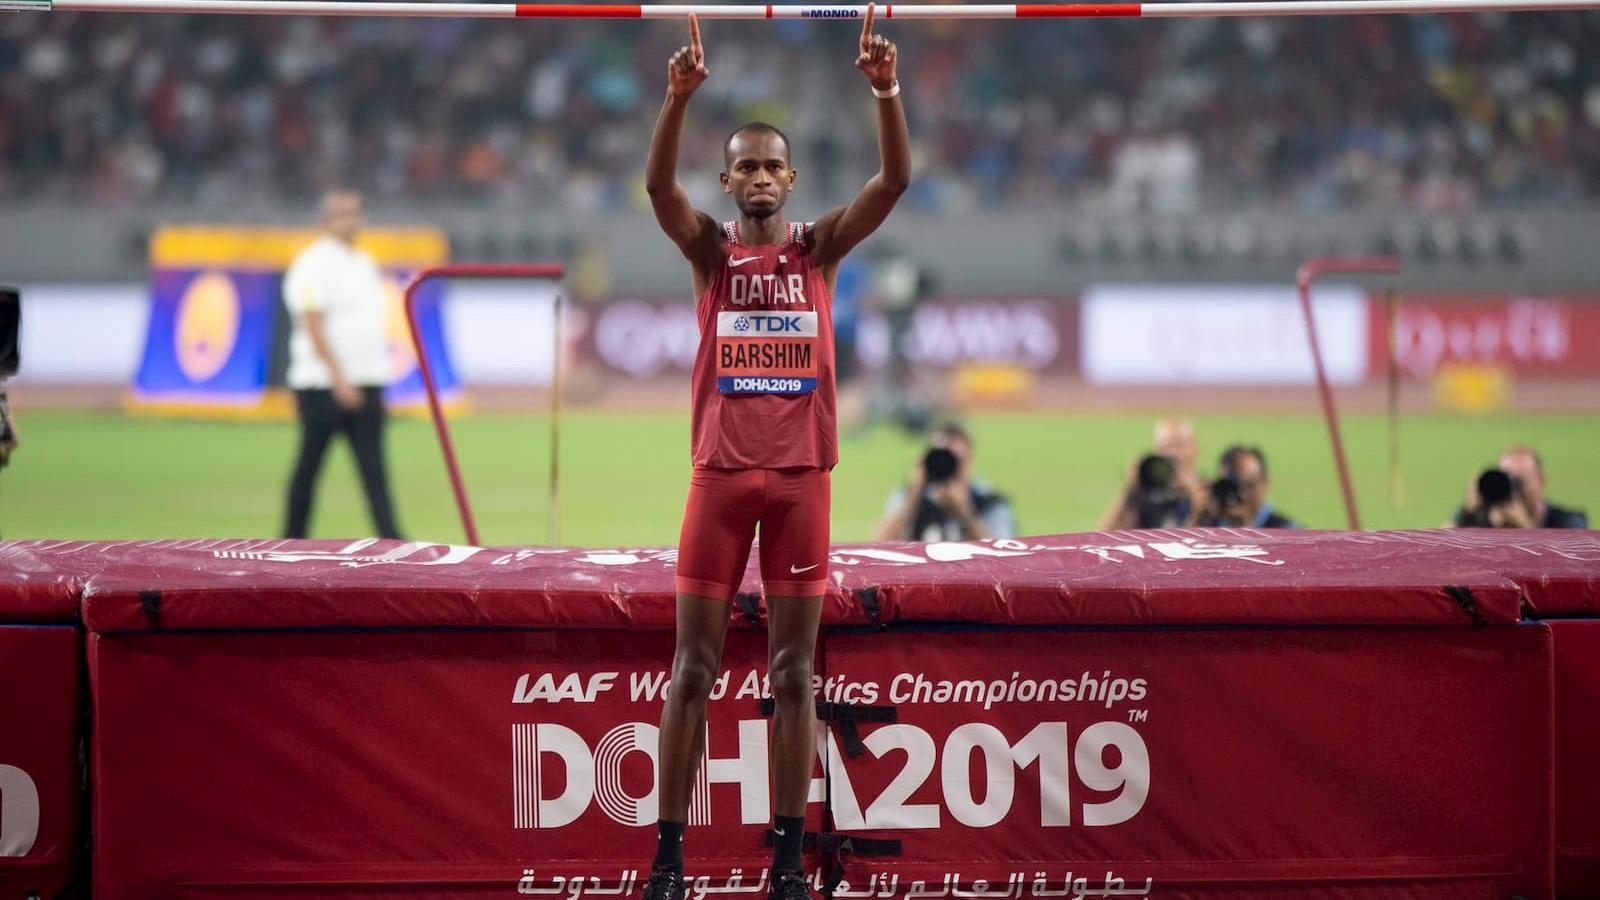 Barshim thrills with high jump gold at IAAF World Athletics Championships